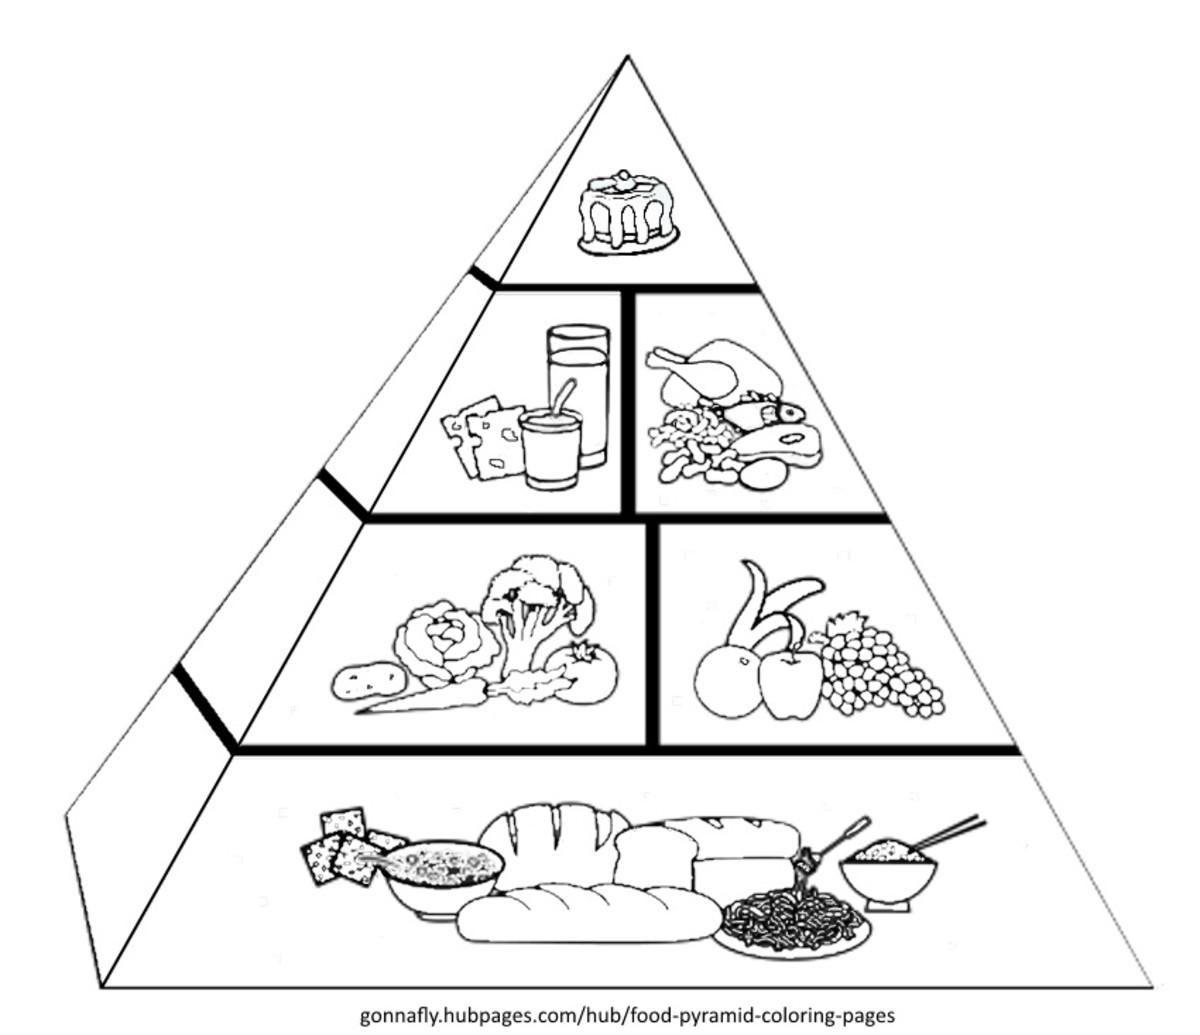 original food pyramid coloring page